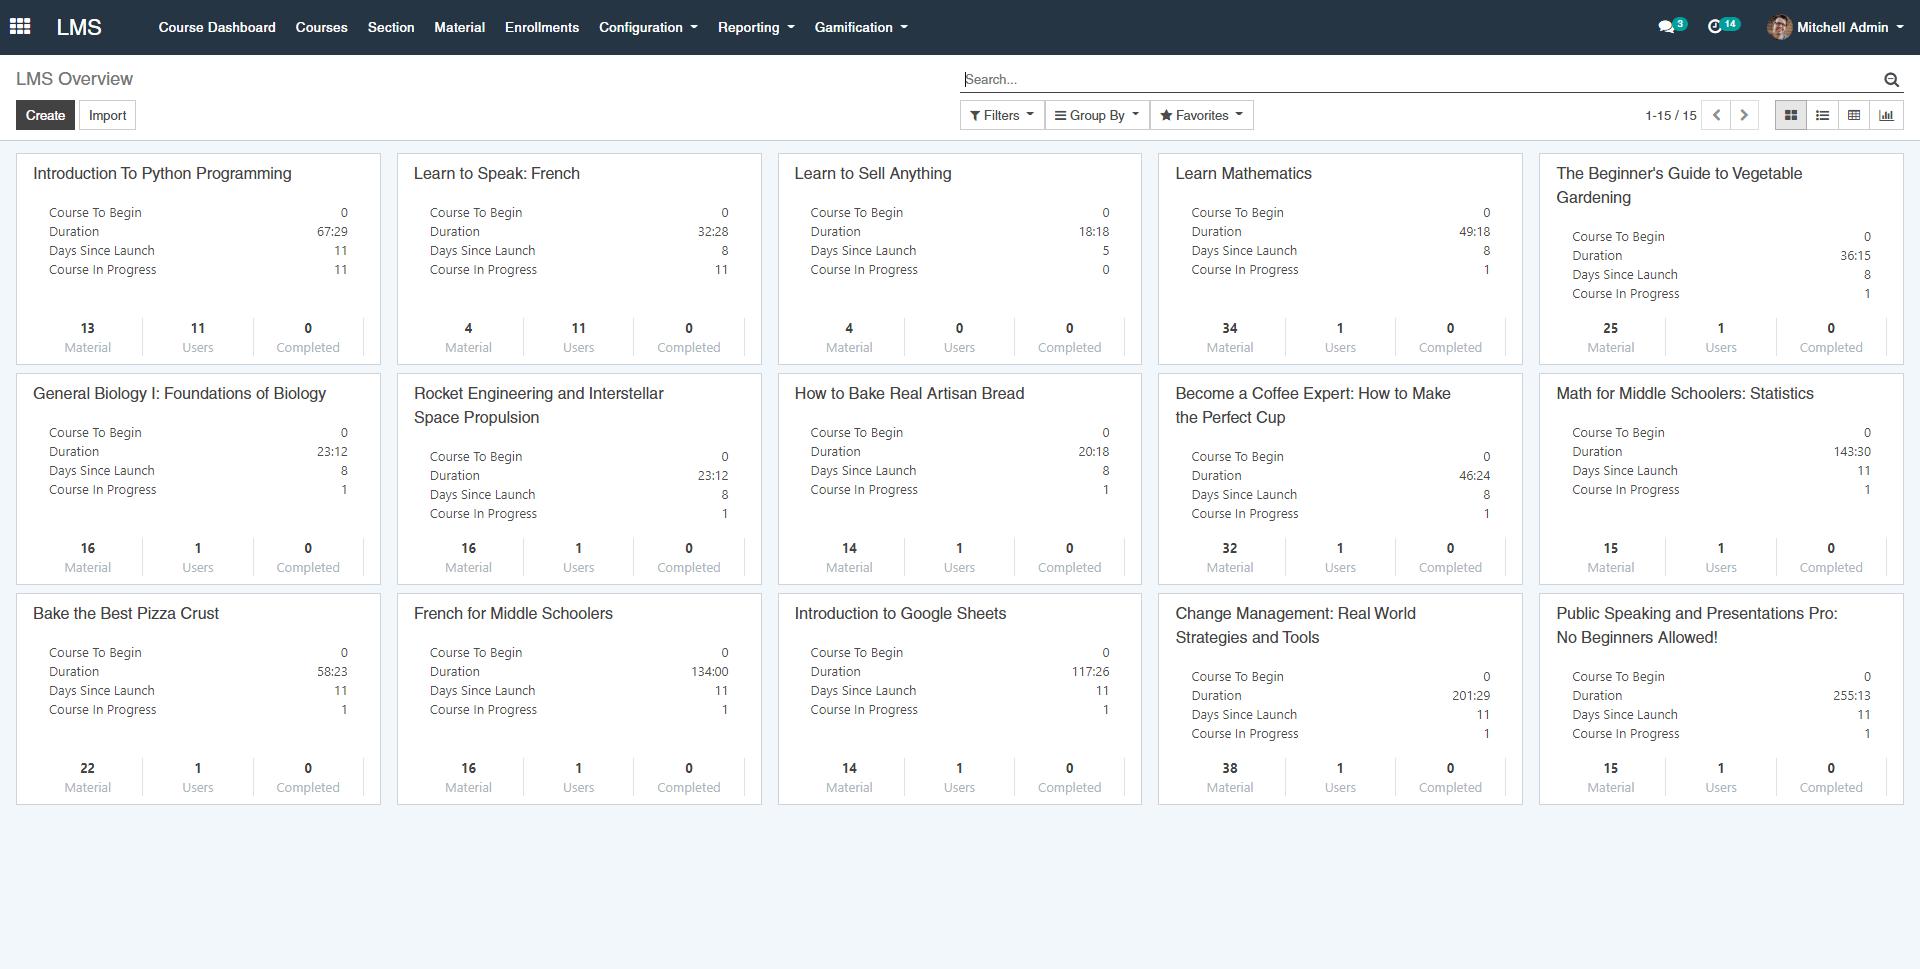 OpenEduCat Software - LMS